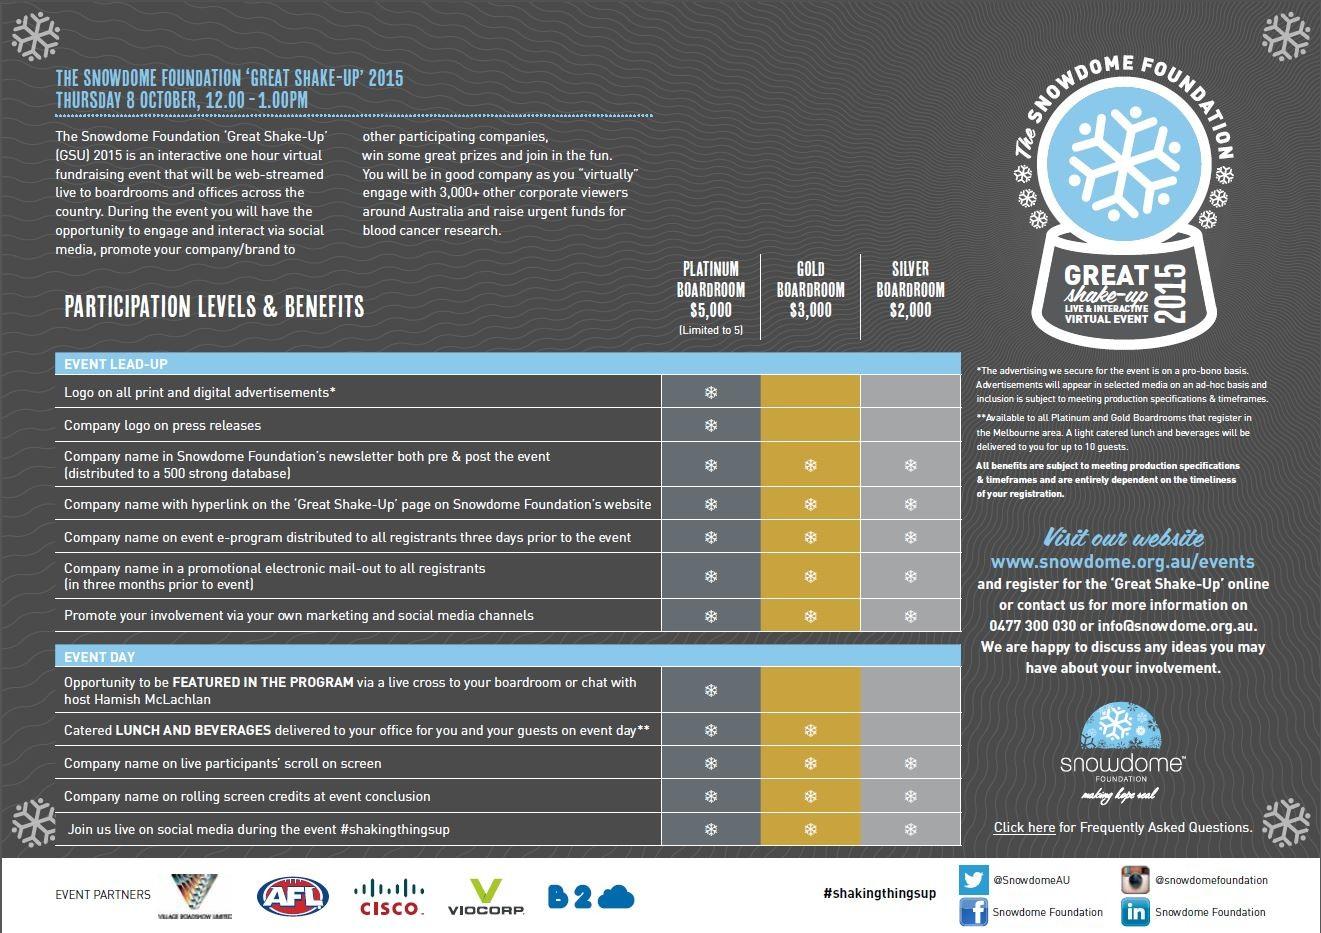 page 2 of sponsorship doc